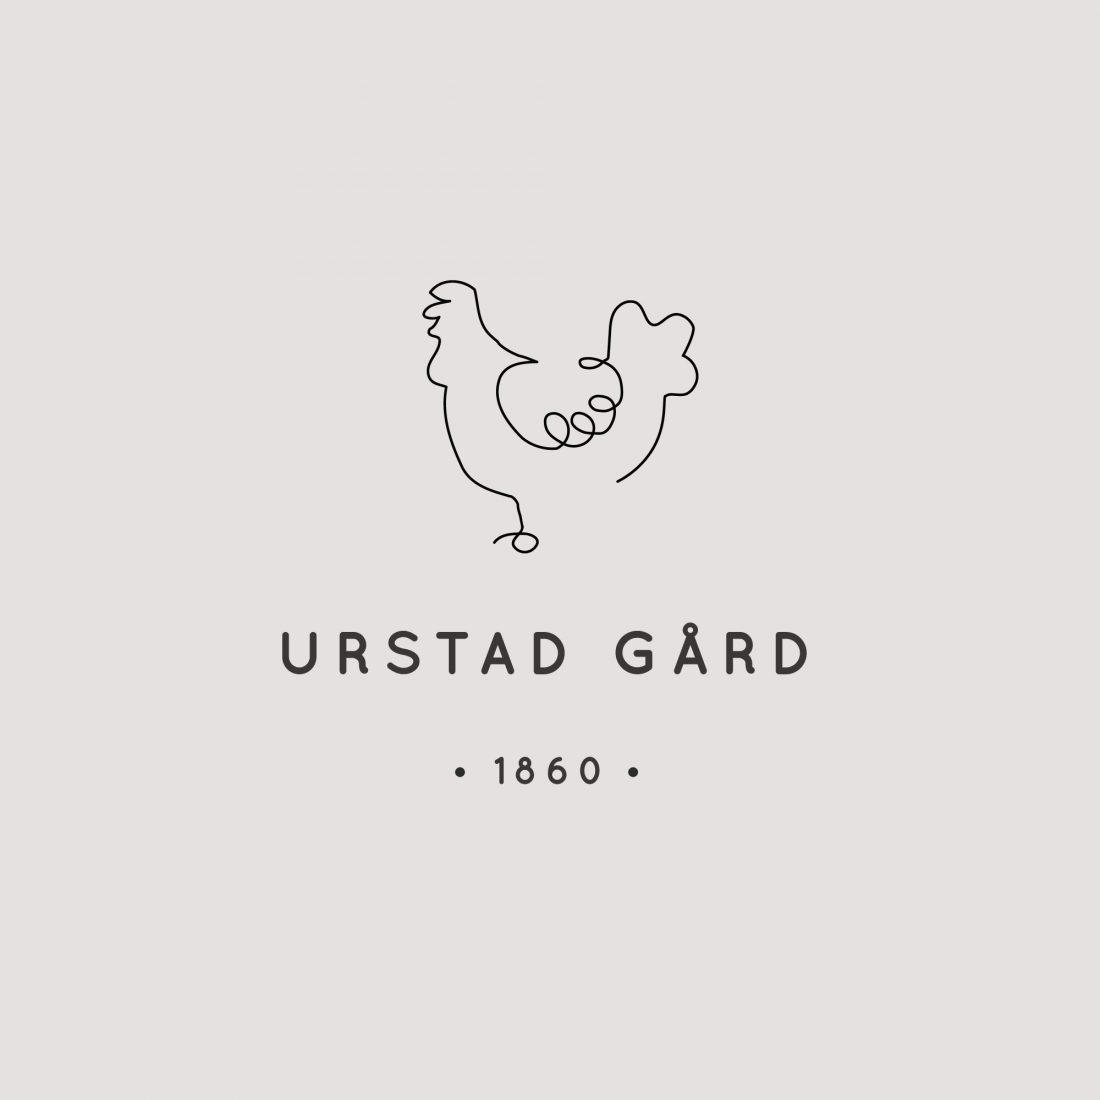 hone-urstad-gard-adesign-studio